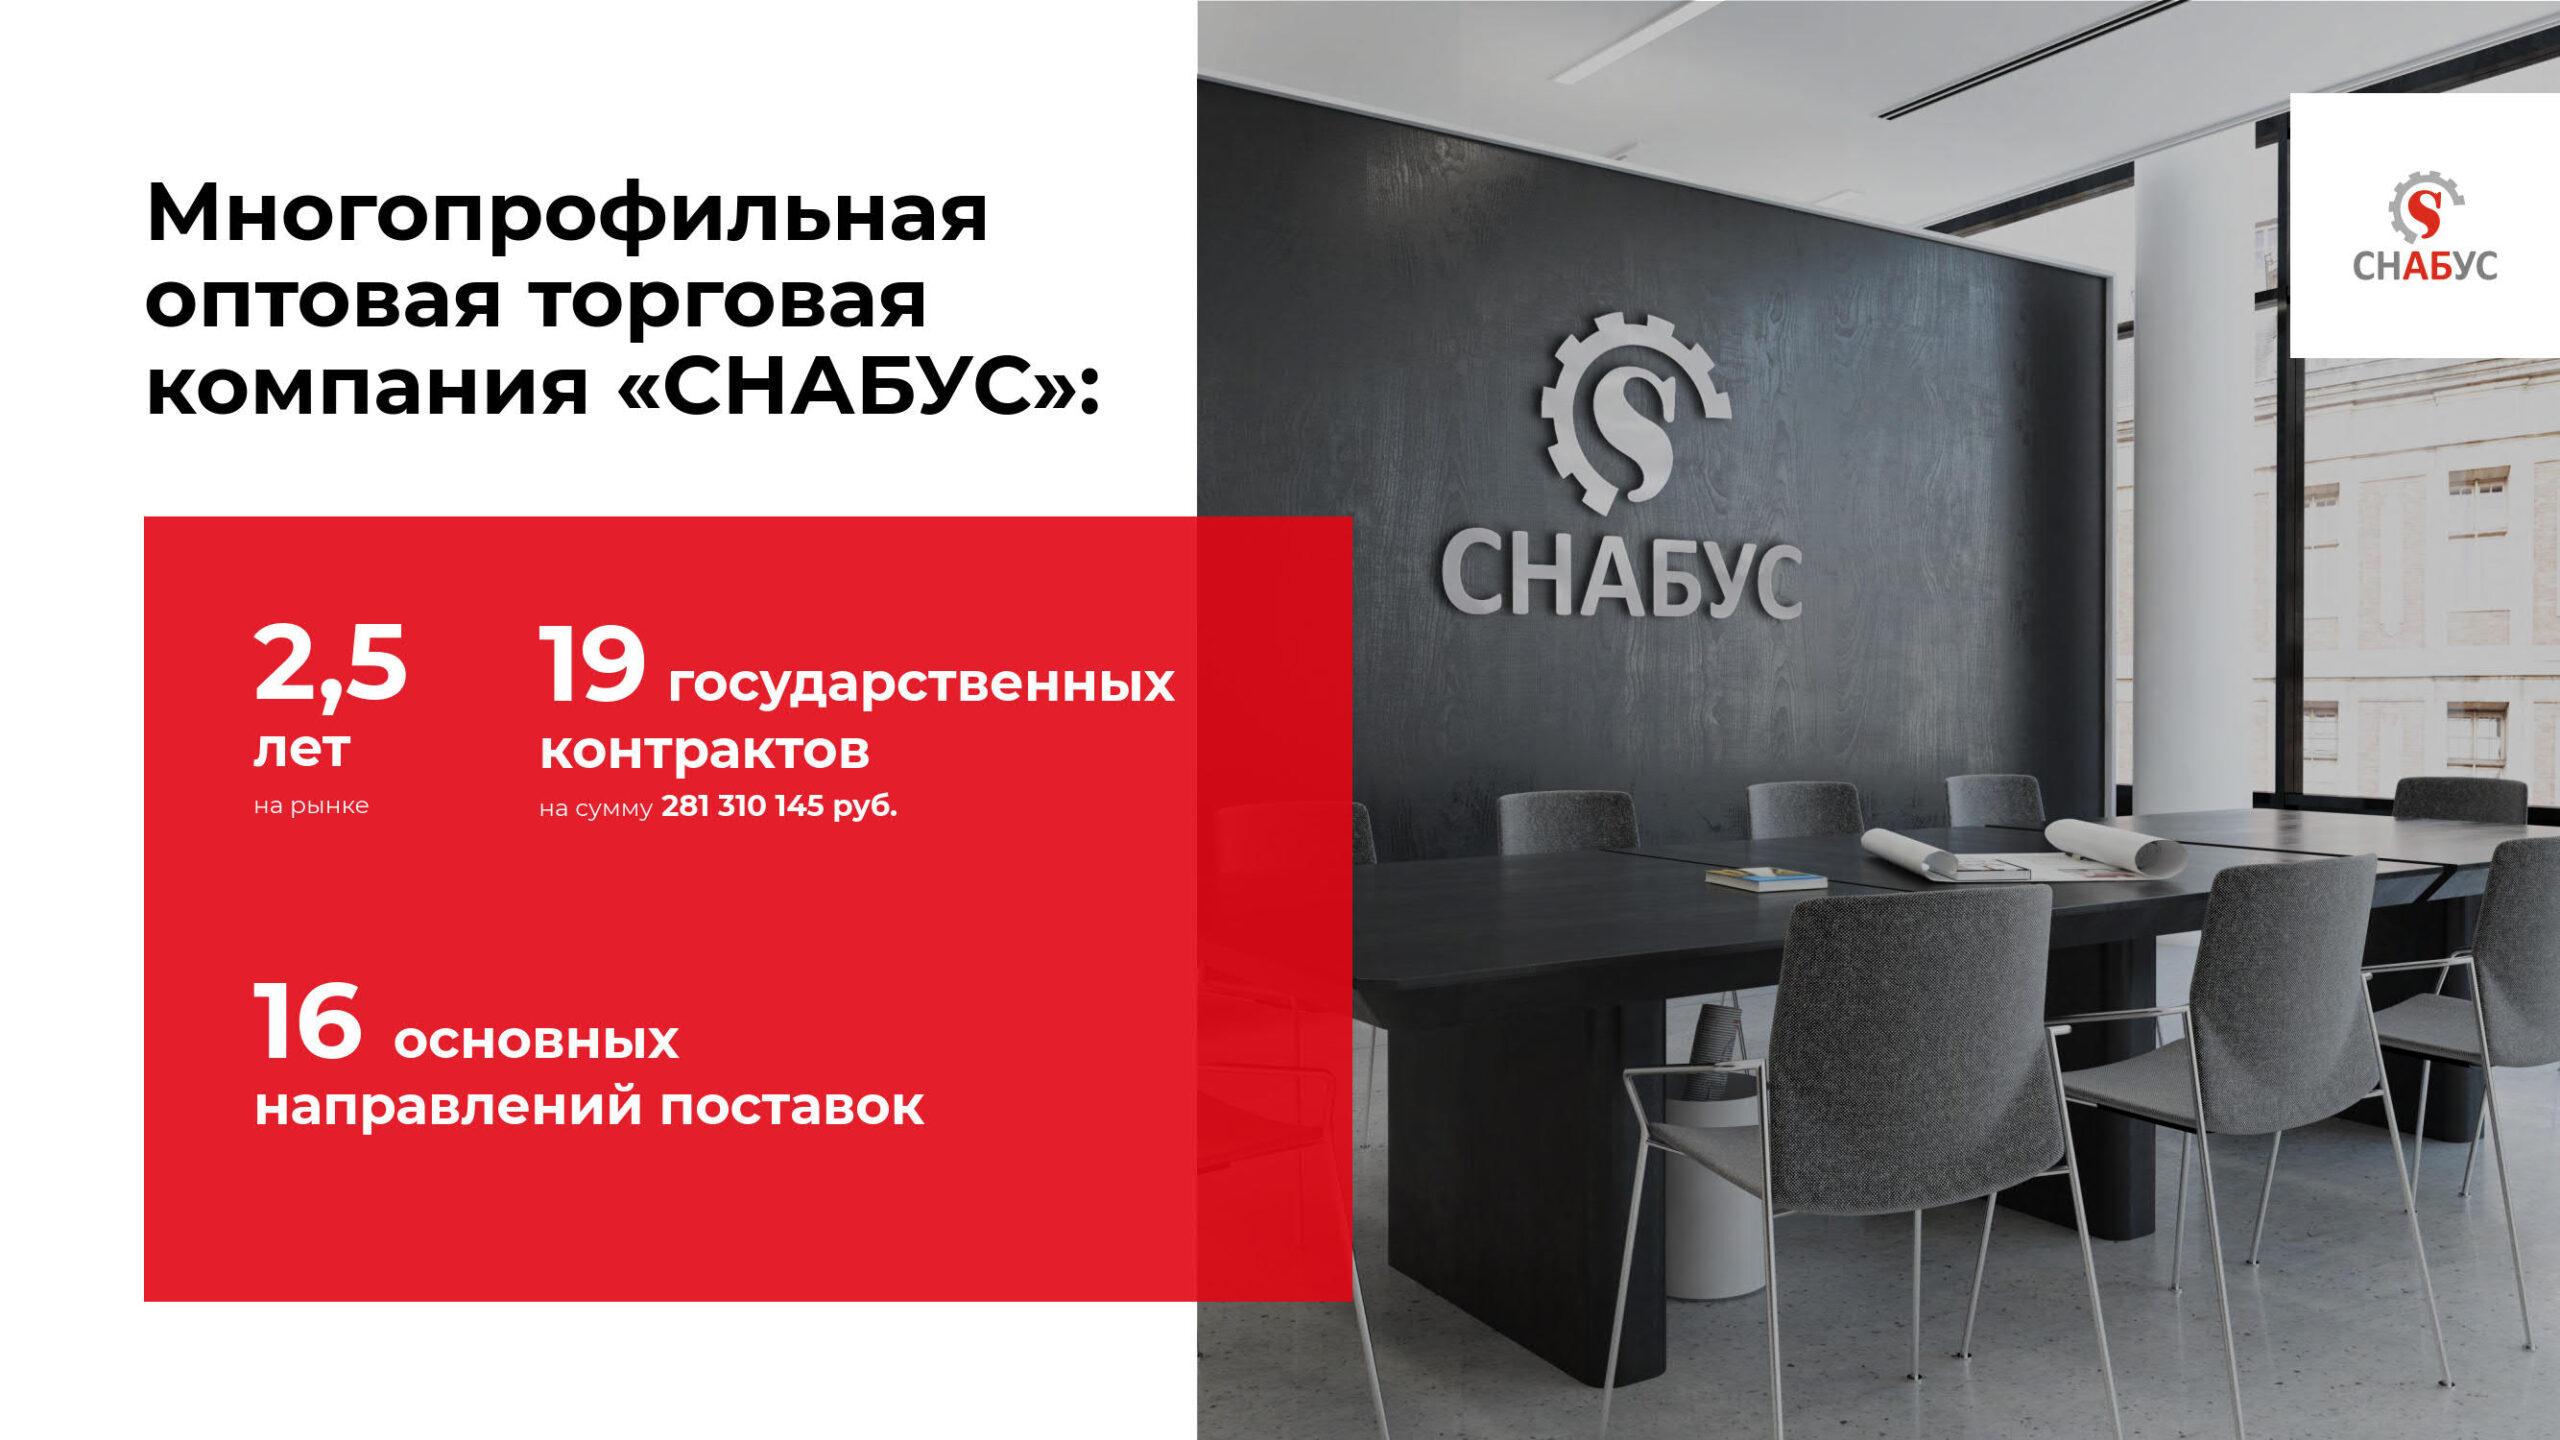 prezentacziya-optovoj-torgovoj-kompanii-gosudarstvennye-kontrakty-napravlenija-postavki